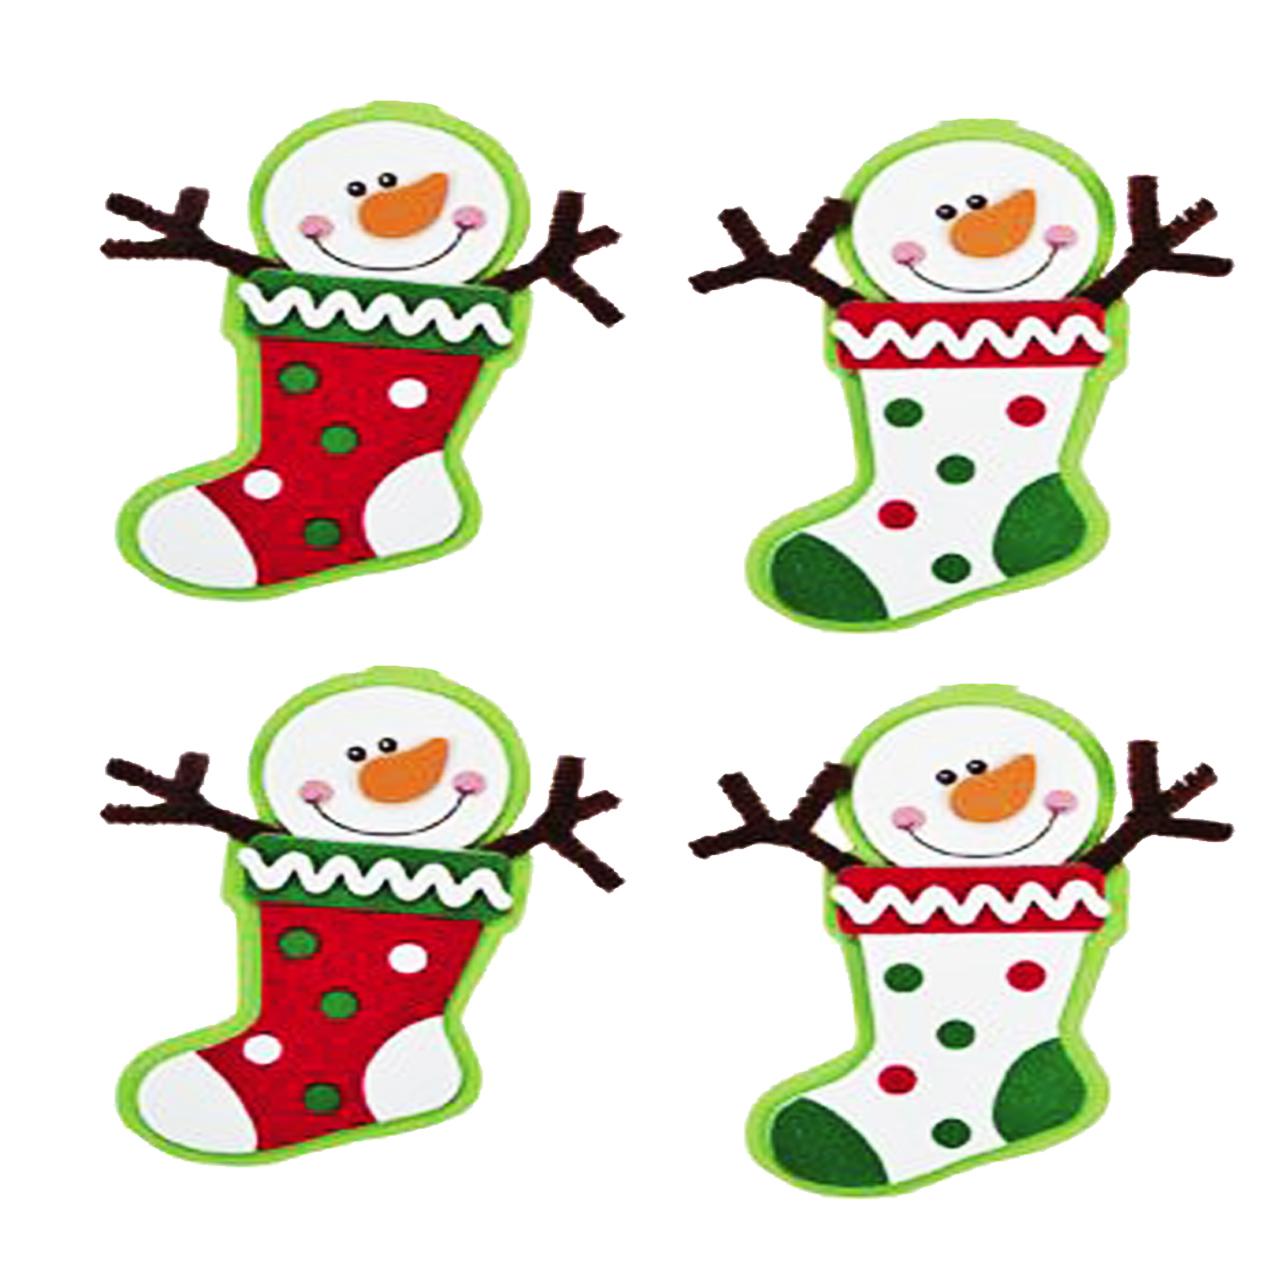 آویز تزیینی هیاهو طرح کریسمس مدل لتونی مجموعه 4 عددی